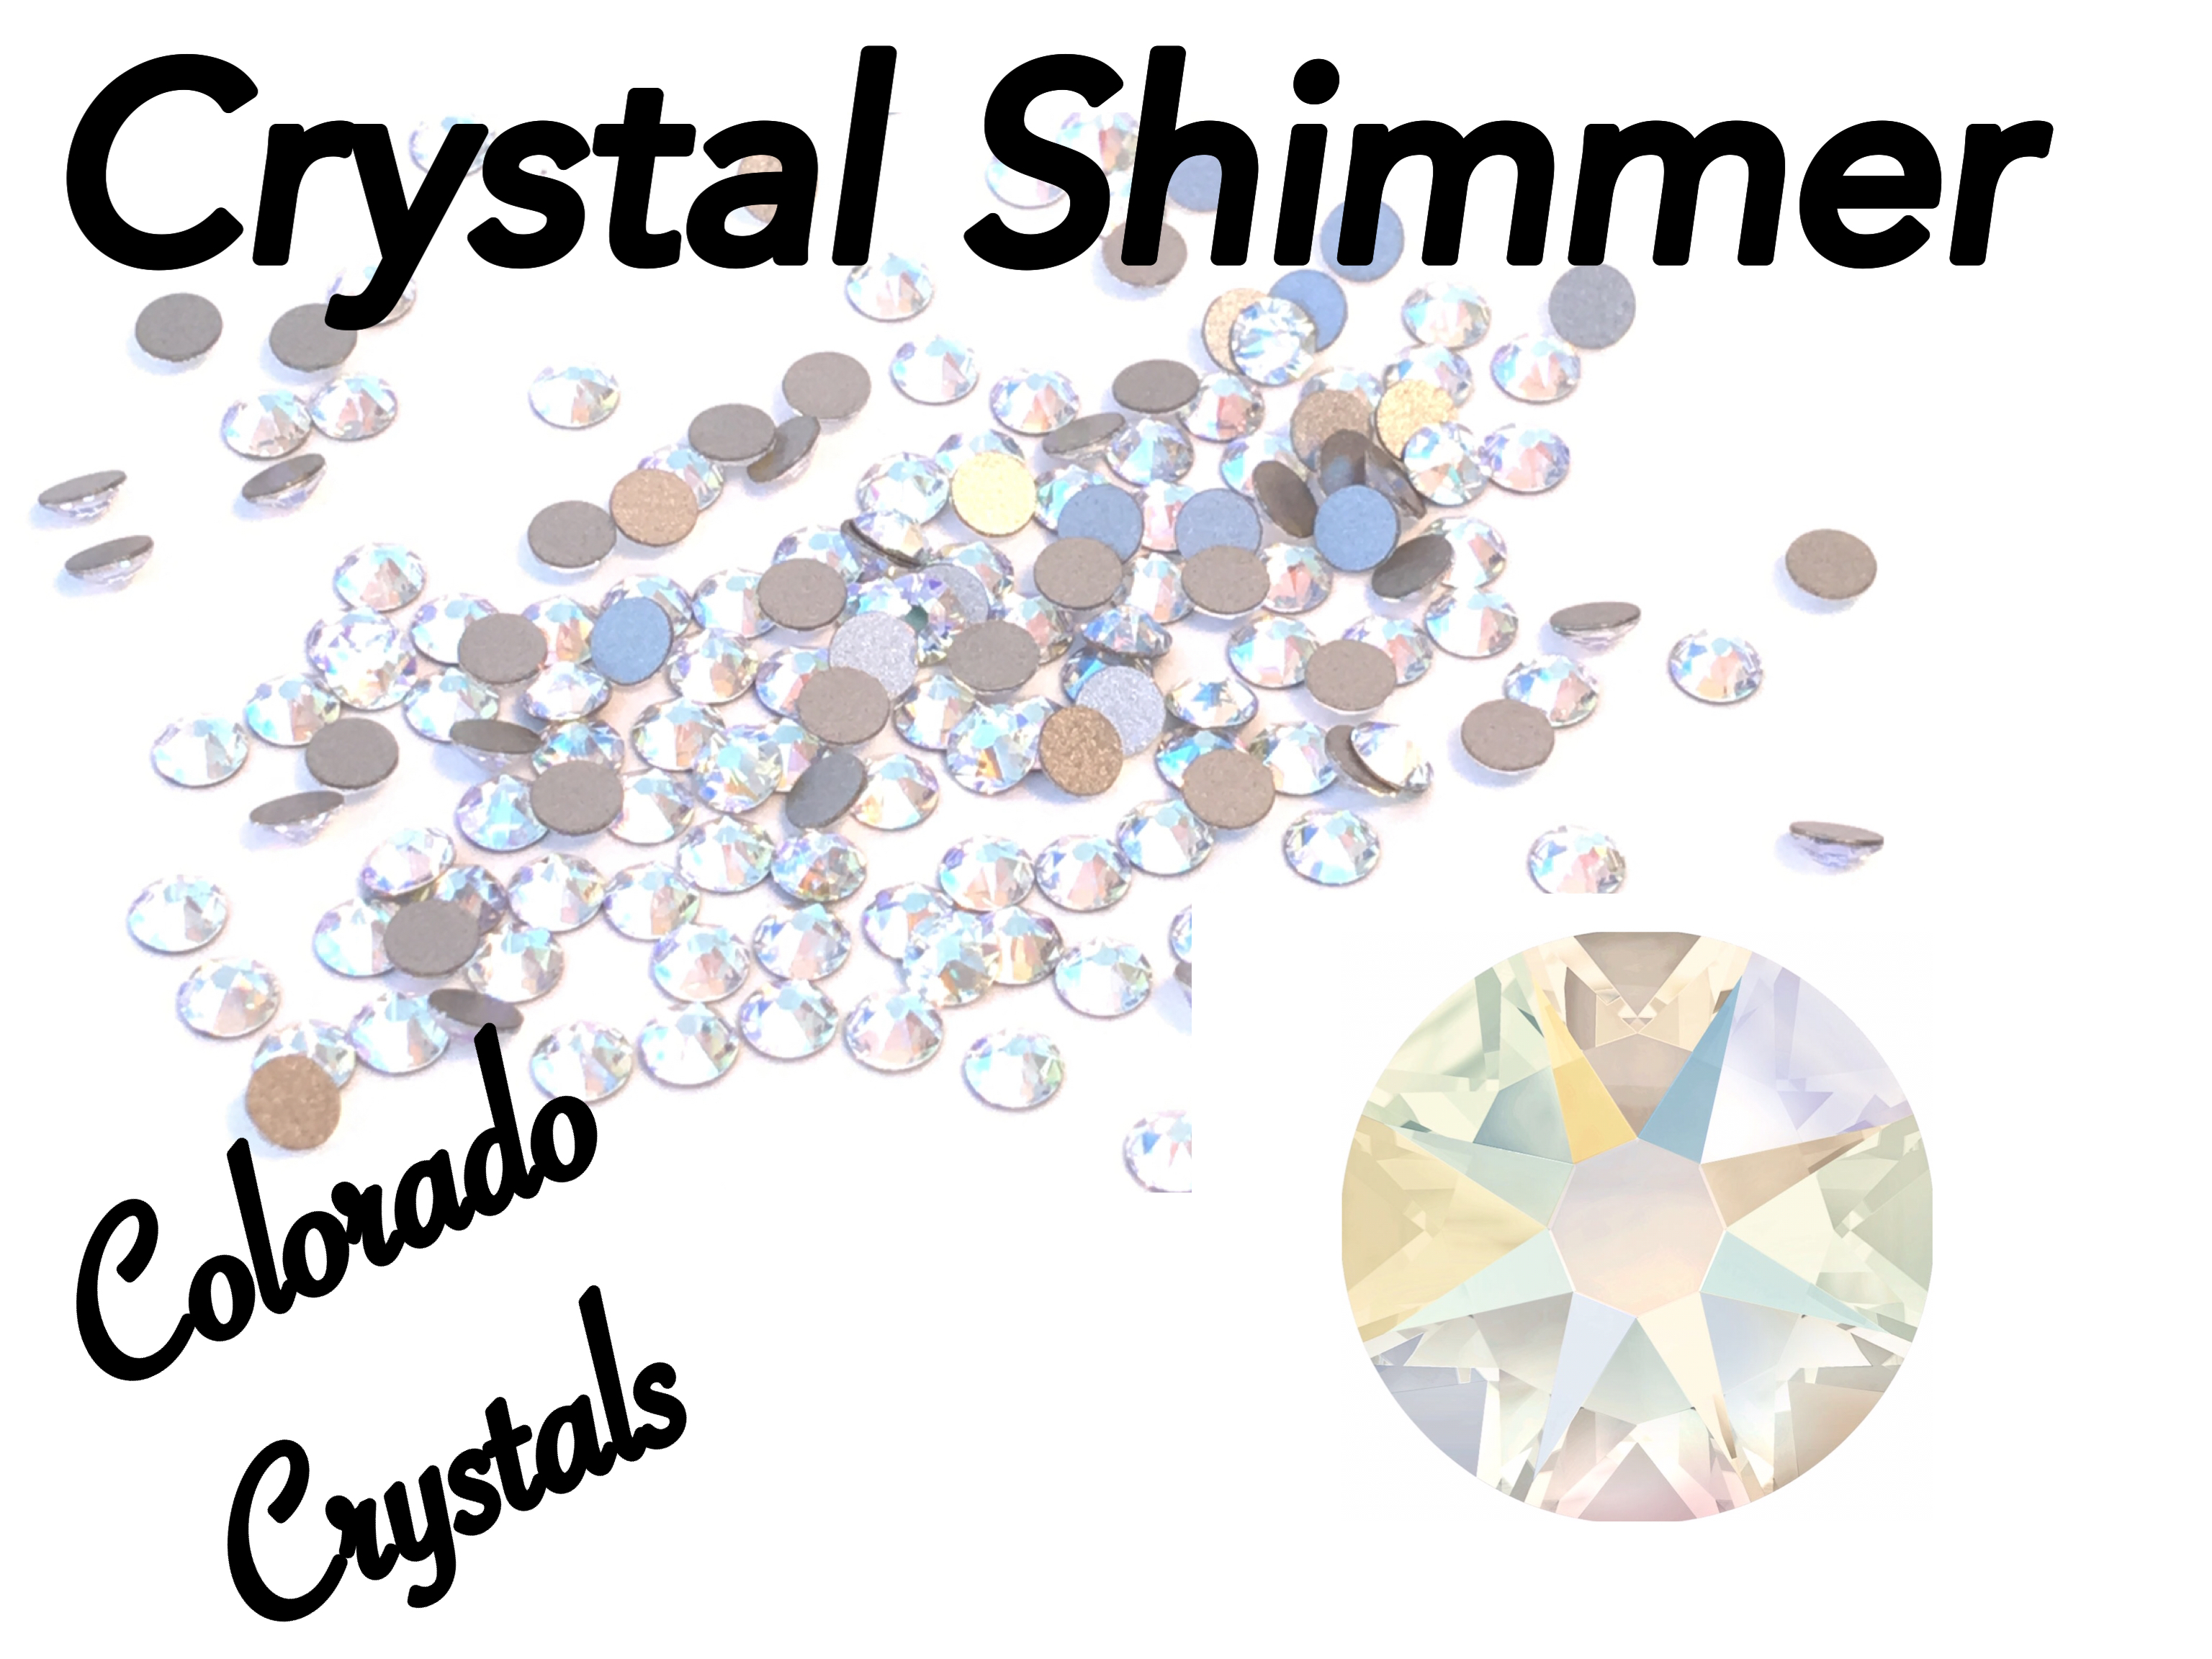 Crystal Shimmer 12ss 2088 Limited Swarovski XIRIUS Rhinestones 12808